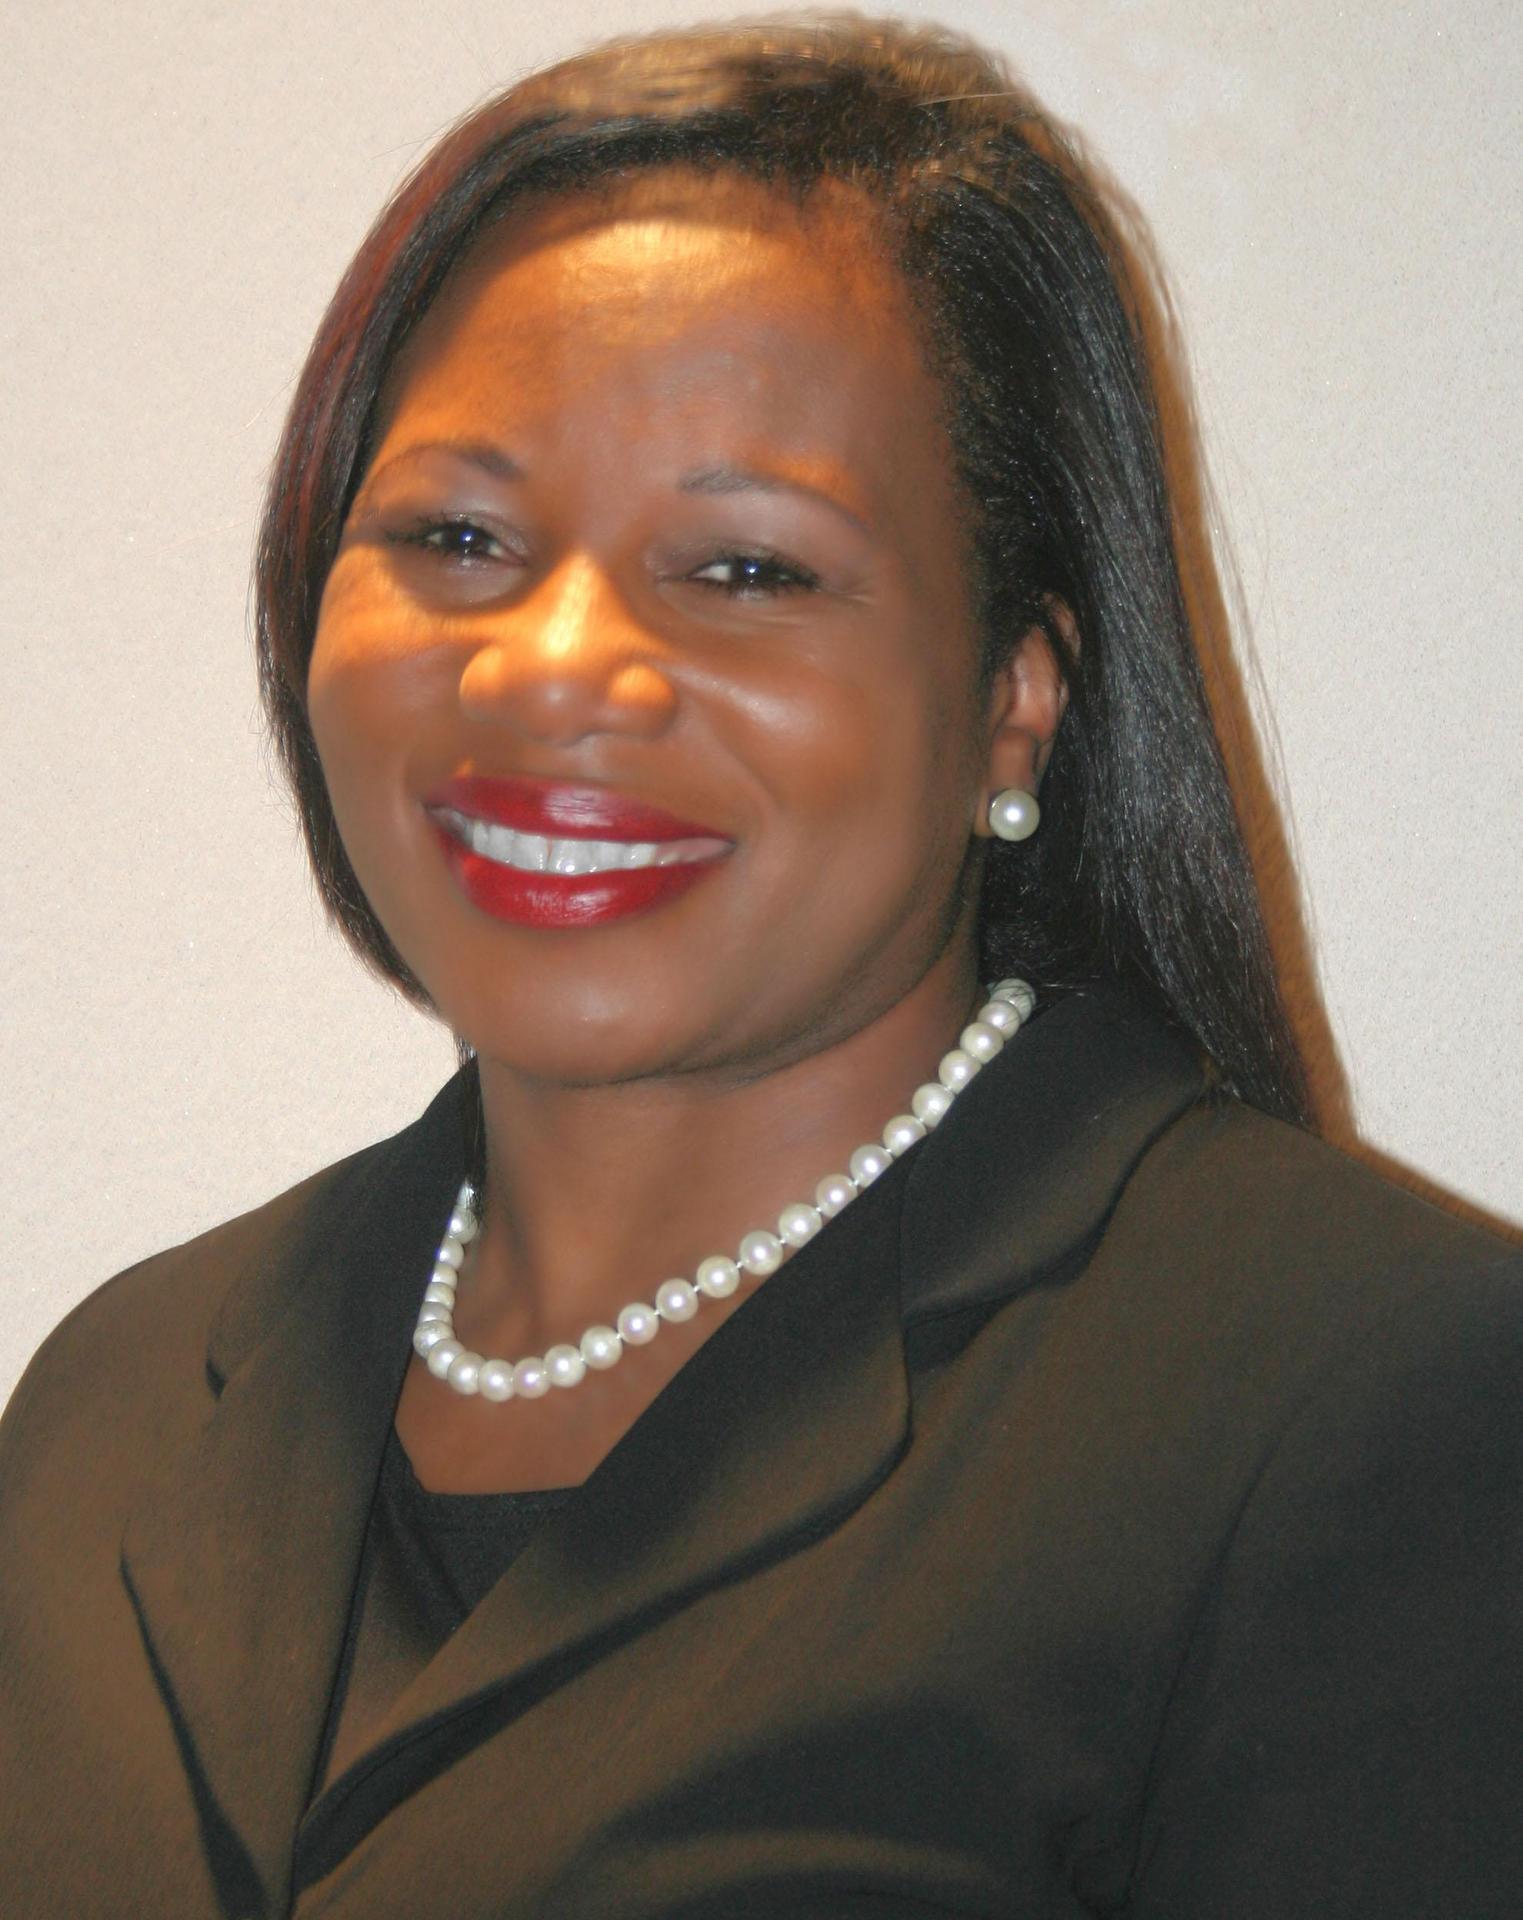 Dr. Irene Amos, Assistant Principal, Morgantown Middle School